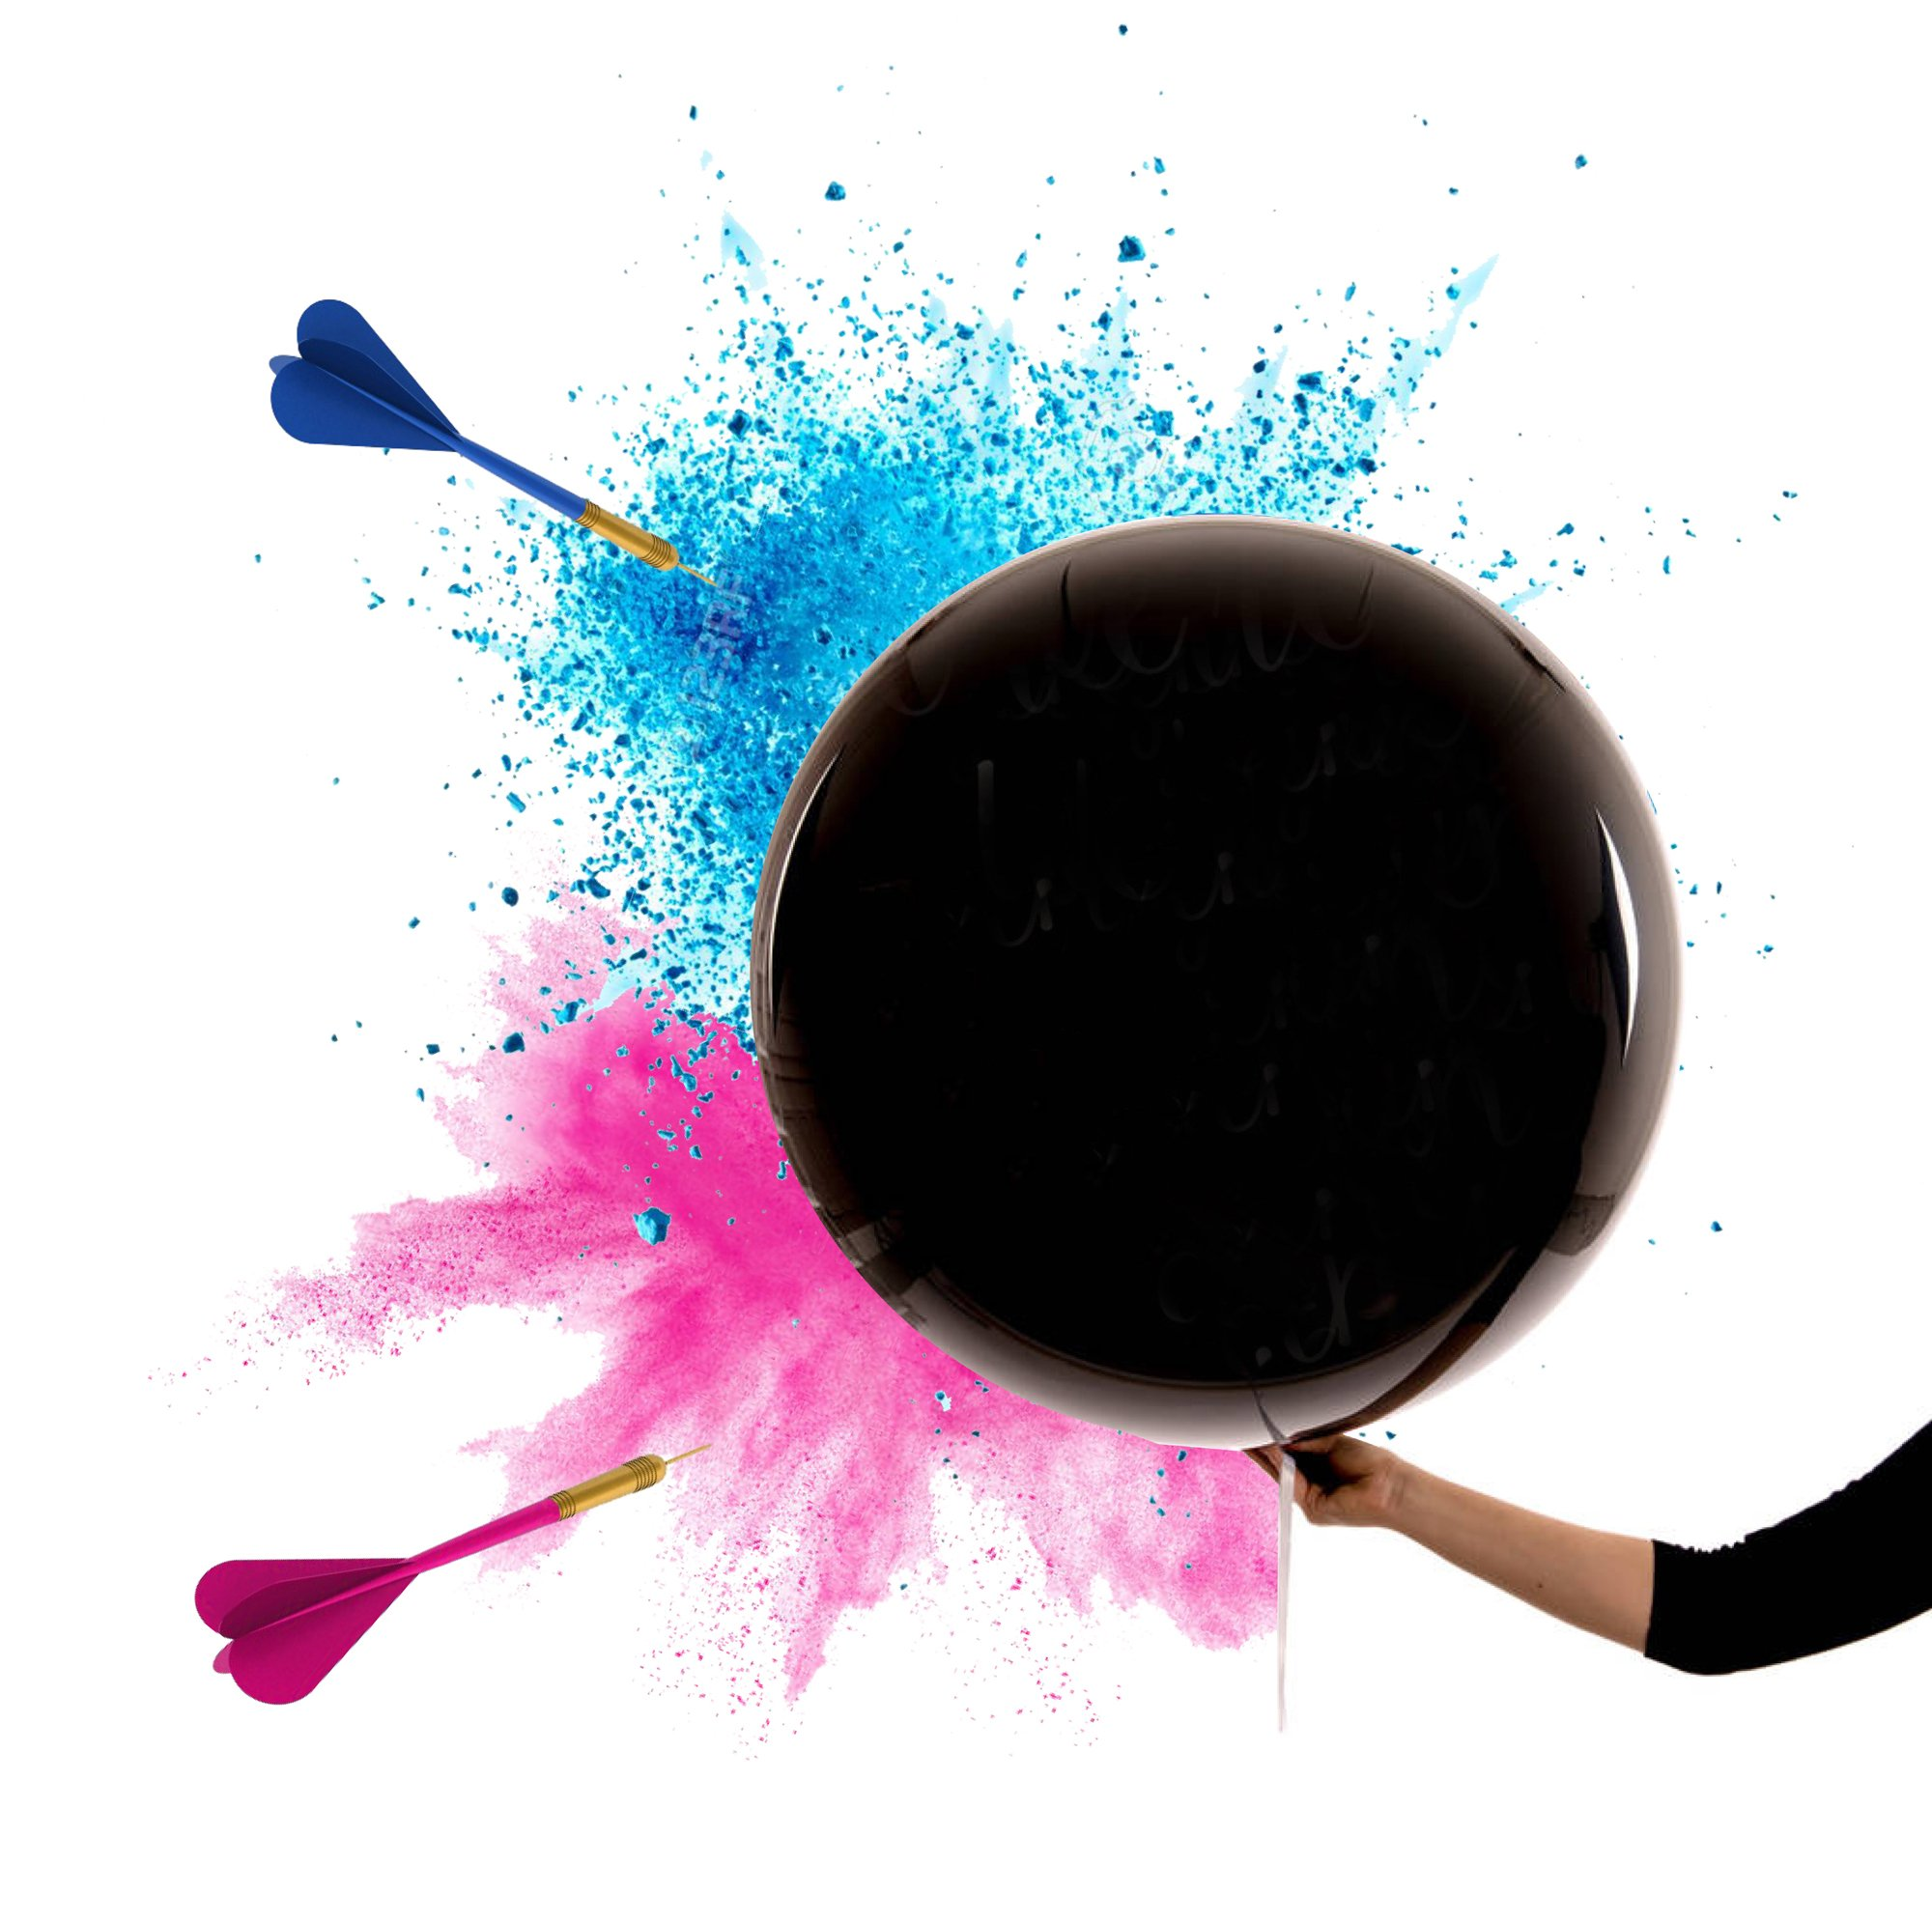 Gender Reveal King-Size Bomb Smoke 36'' Black Balloon Pink and Blue Powder Two Darts Gender Reveal Balloon